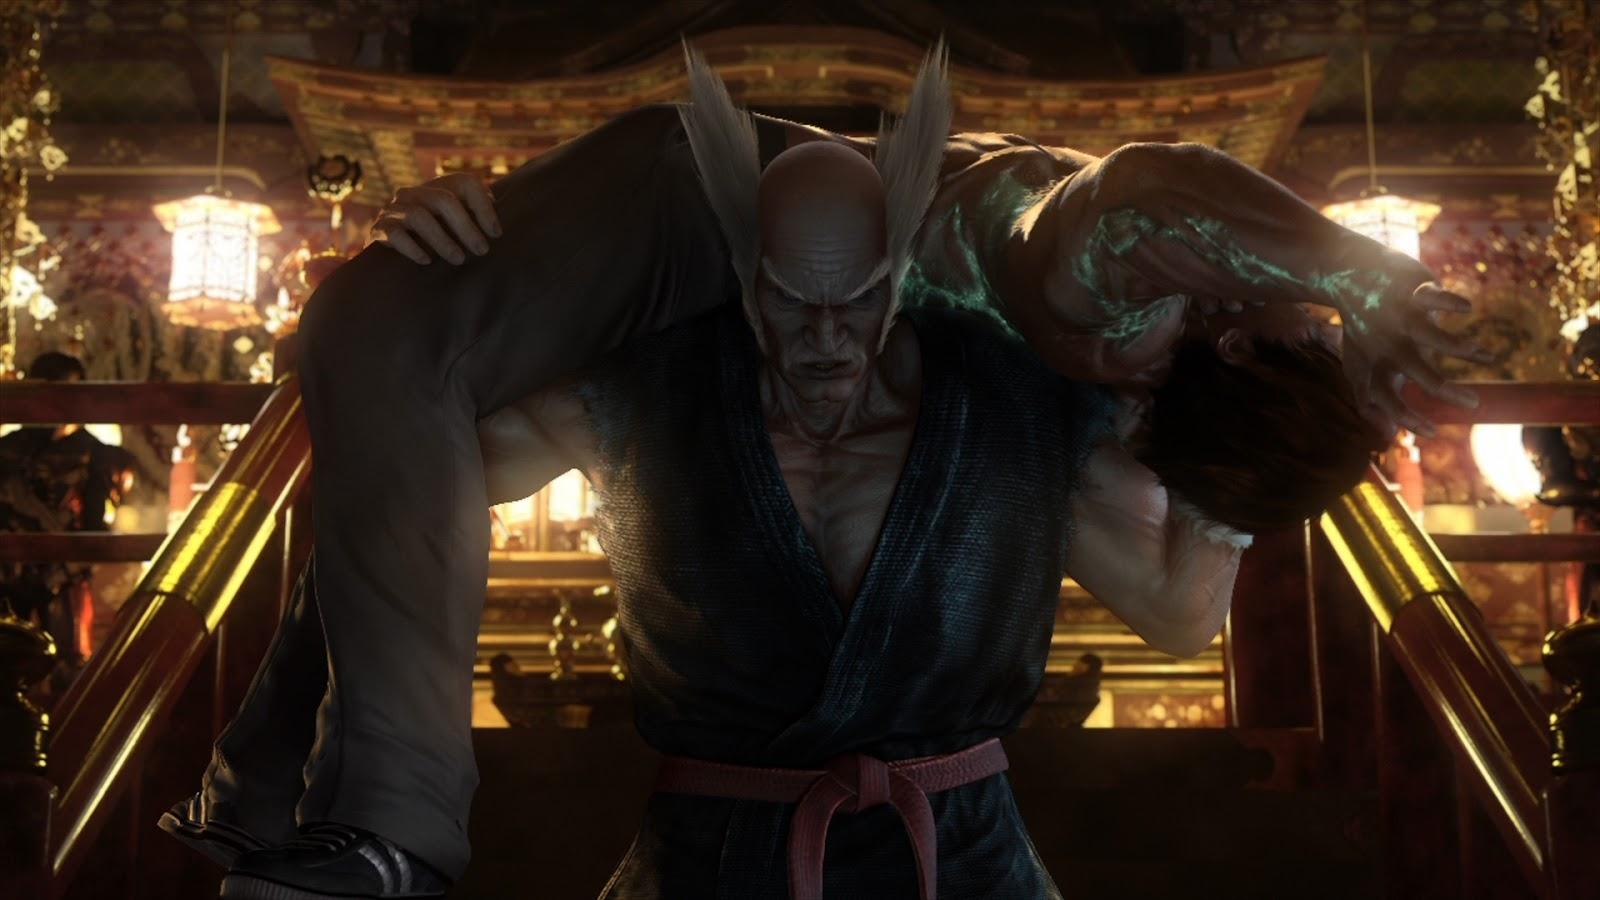 Tekken+Blood+Vengeance+%282011%29+1080p+BDRemux+-+Descargatepelis.com.mkv_snapshot_01.01.03.972.jpg (1600×900)